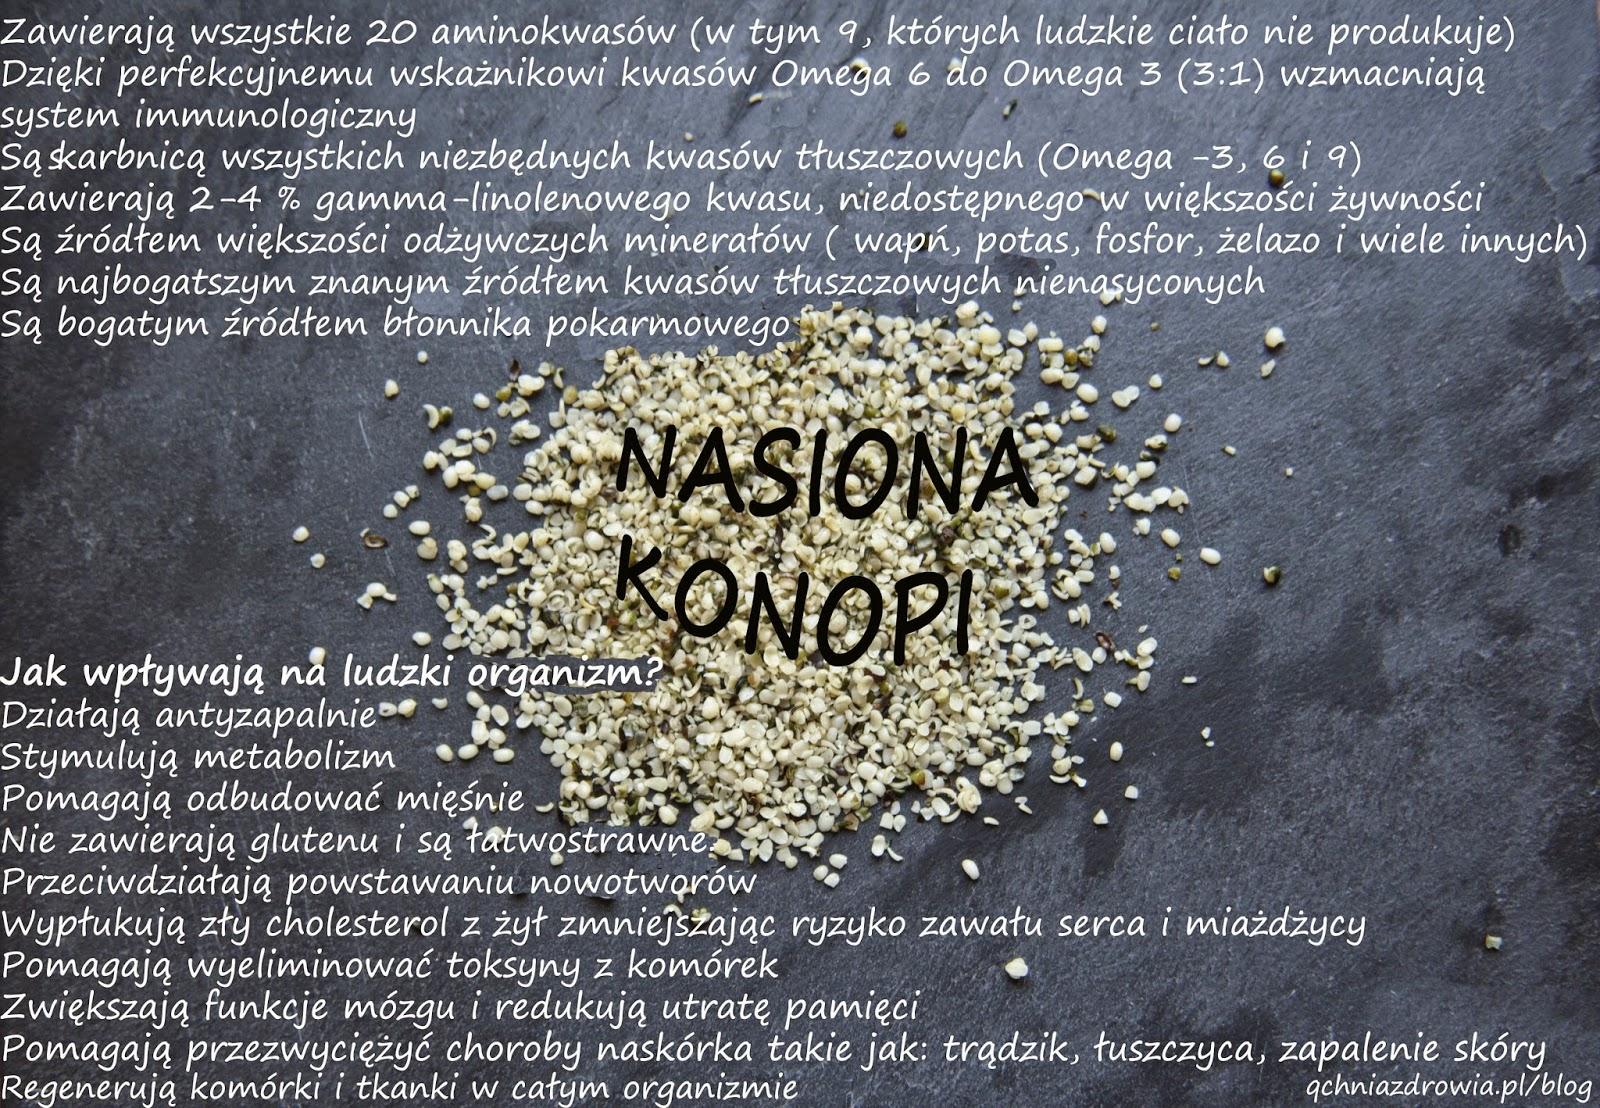 http://qchniazdrowia.pl/blog/blog/2014/08/20/edukacyjne-srody-nasiona-konopi/